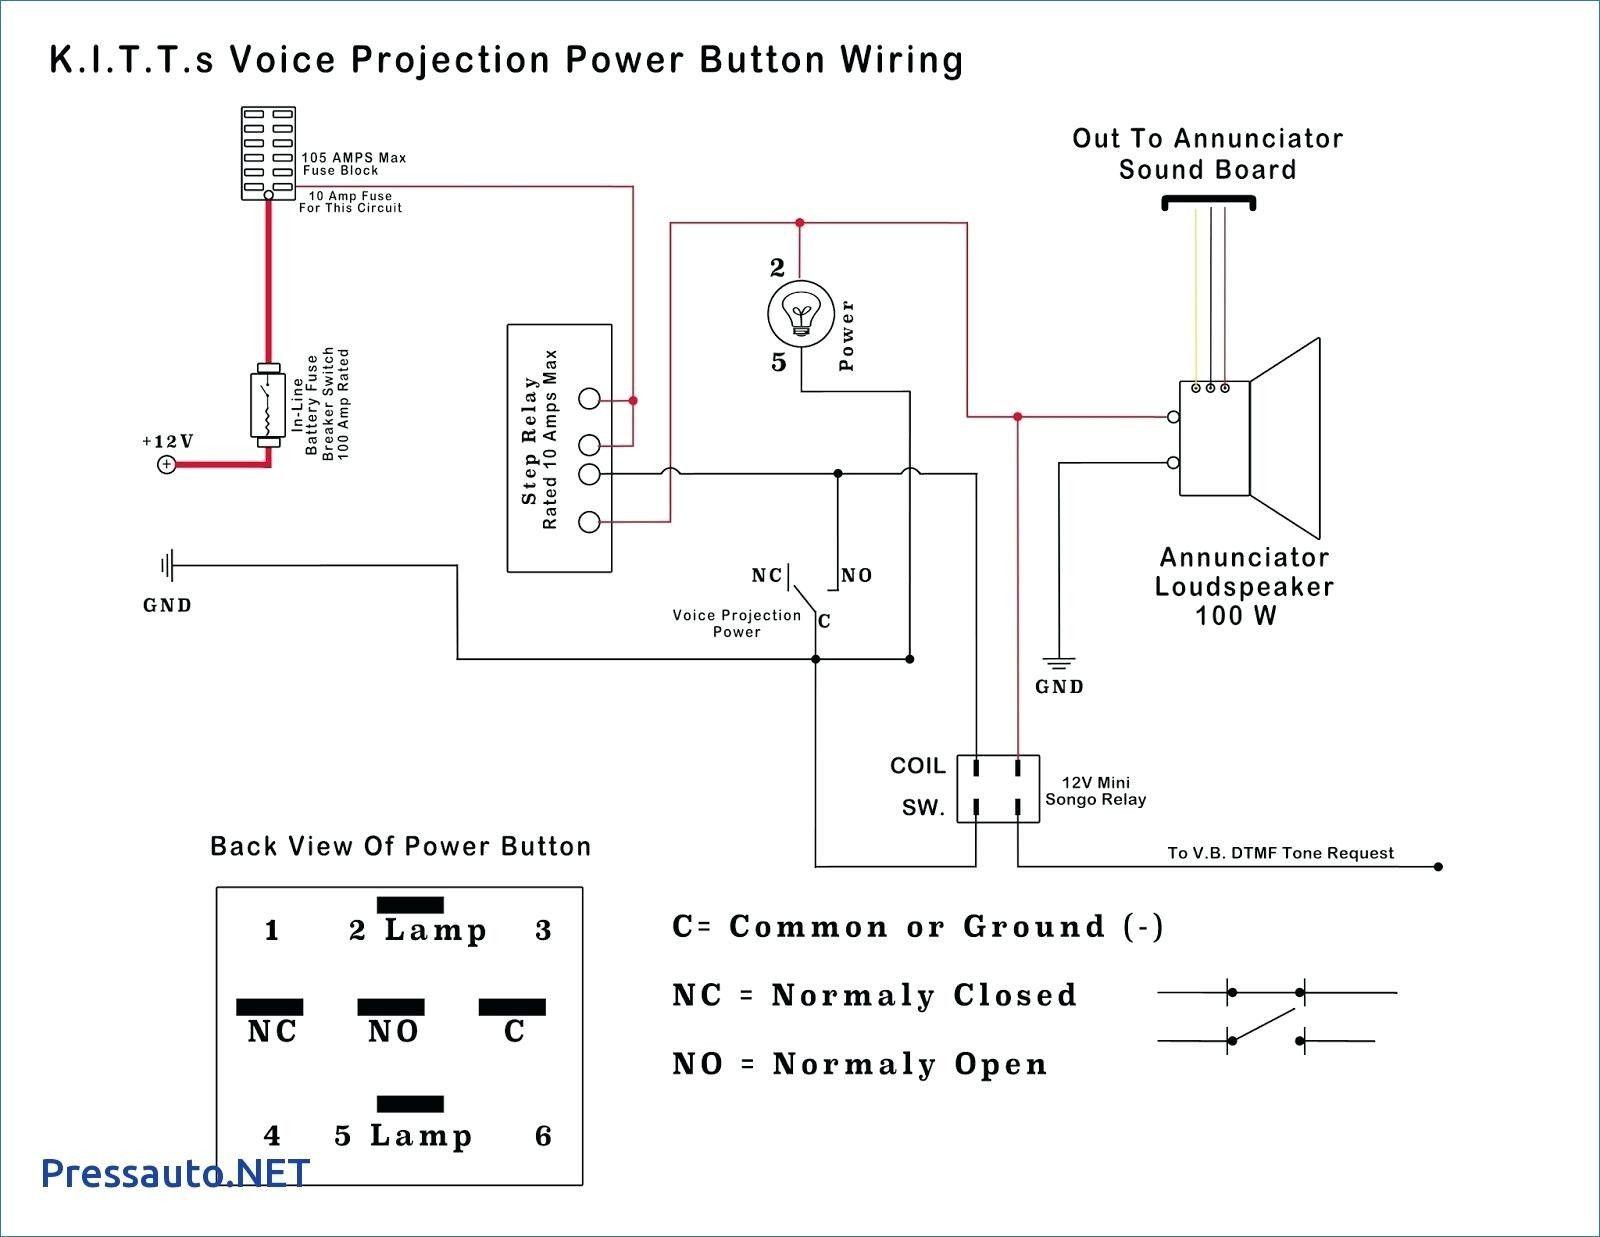 1997 7 3 powerstroke glow plug relay wiring diagram visio 2013 uml deployment 97 f350 gpr schematic library repair manual